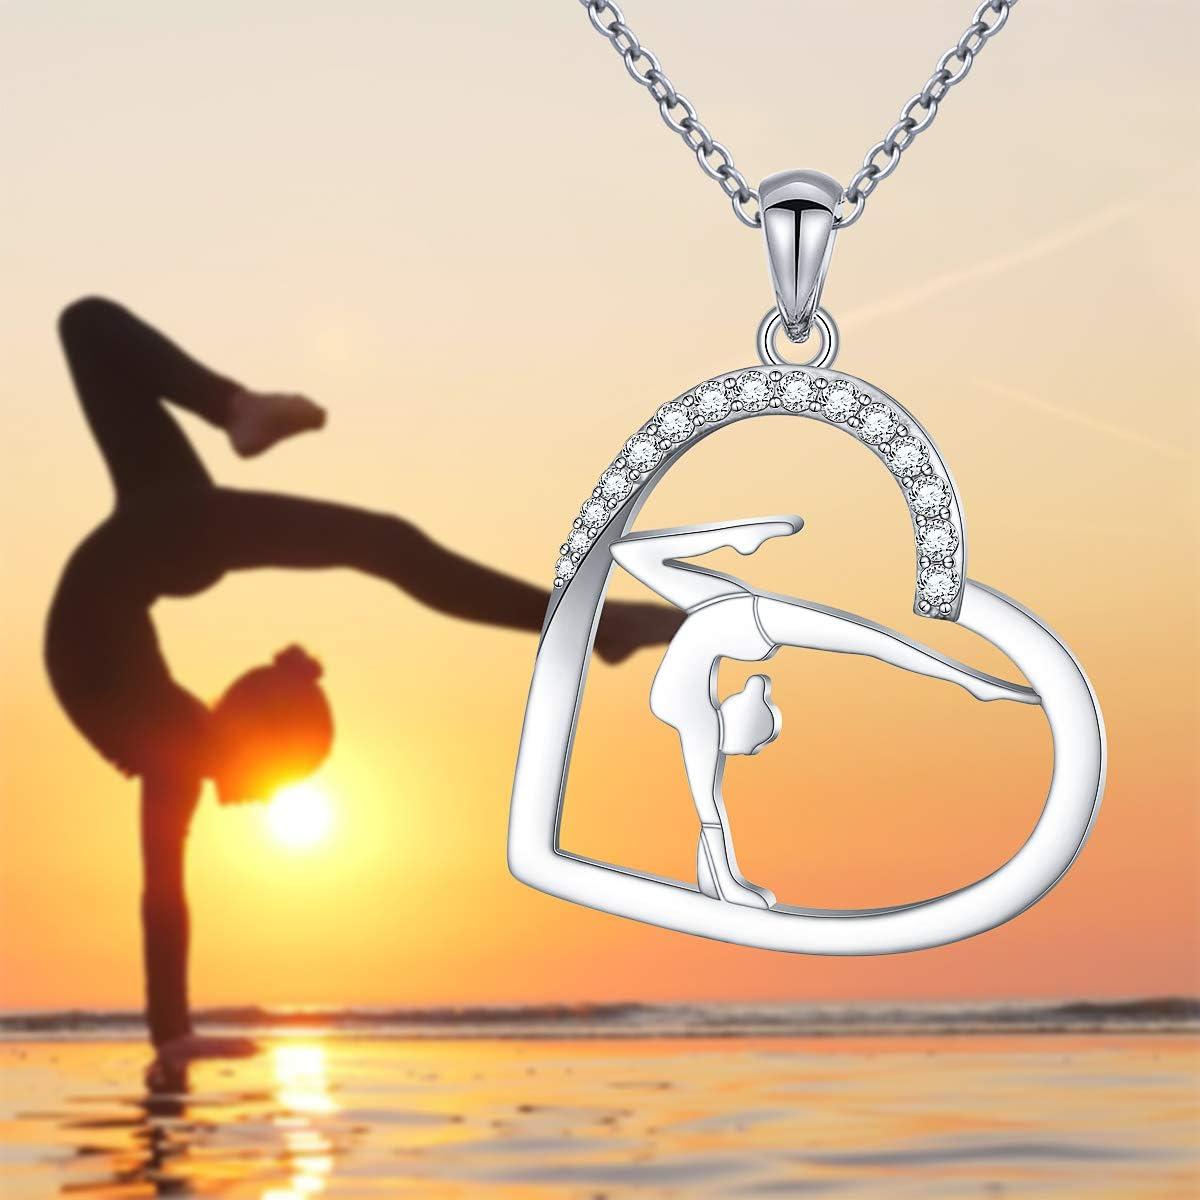 jewelleryjoy Yoga Gymnastics Dance Tibetan Silver Clip On Lobster Clasp Charm